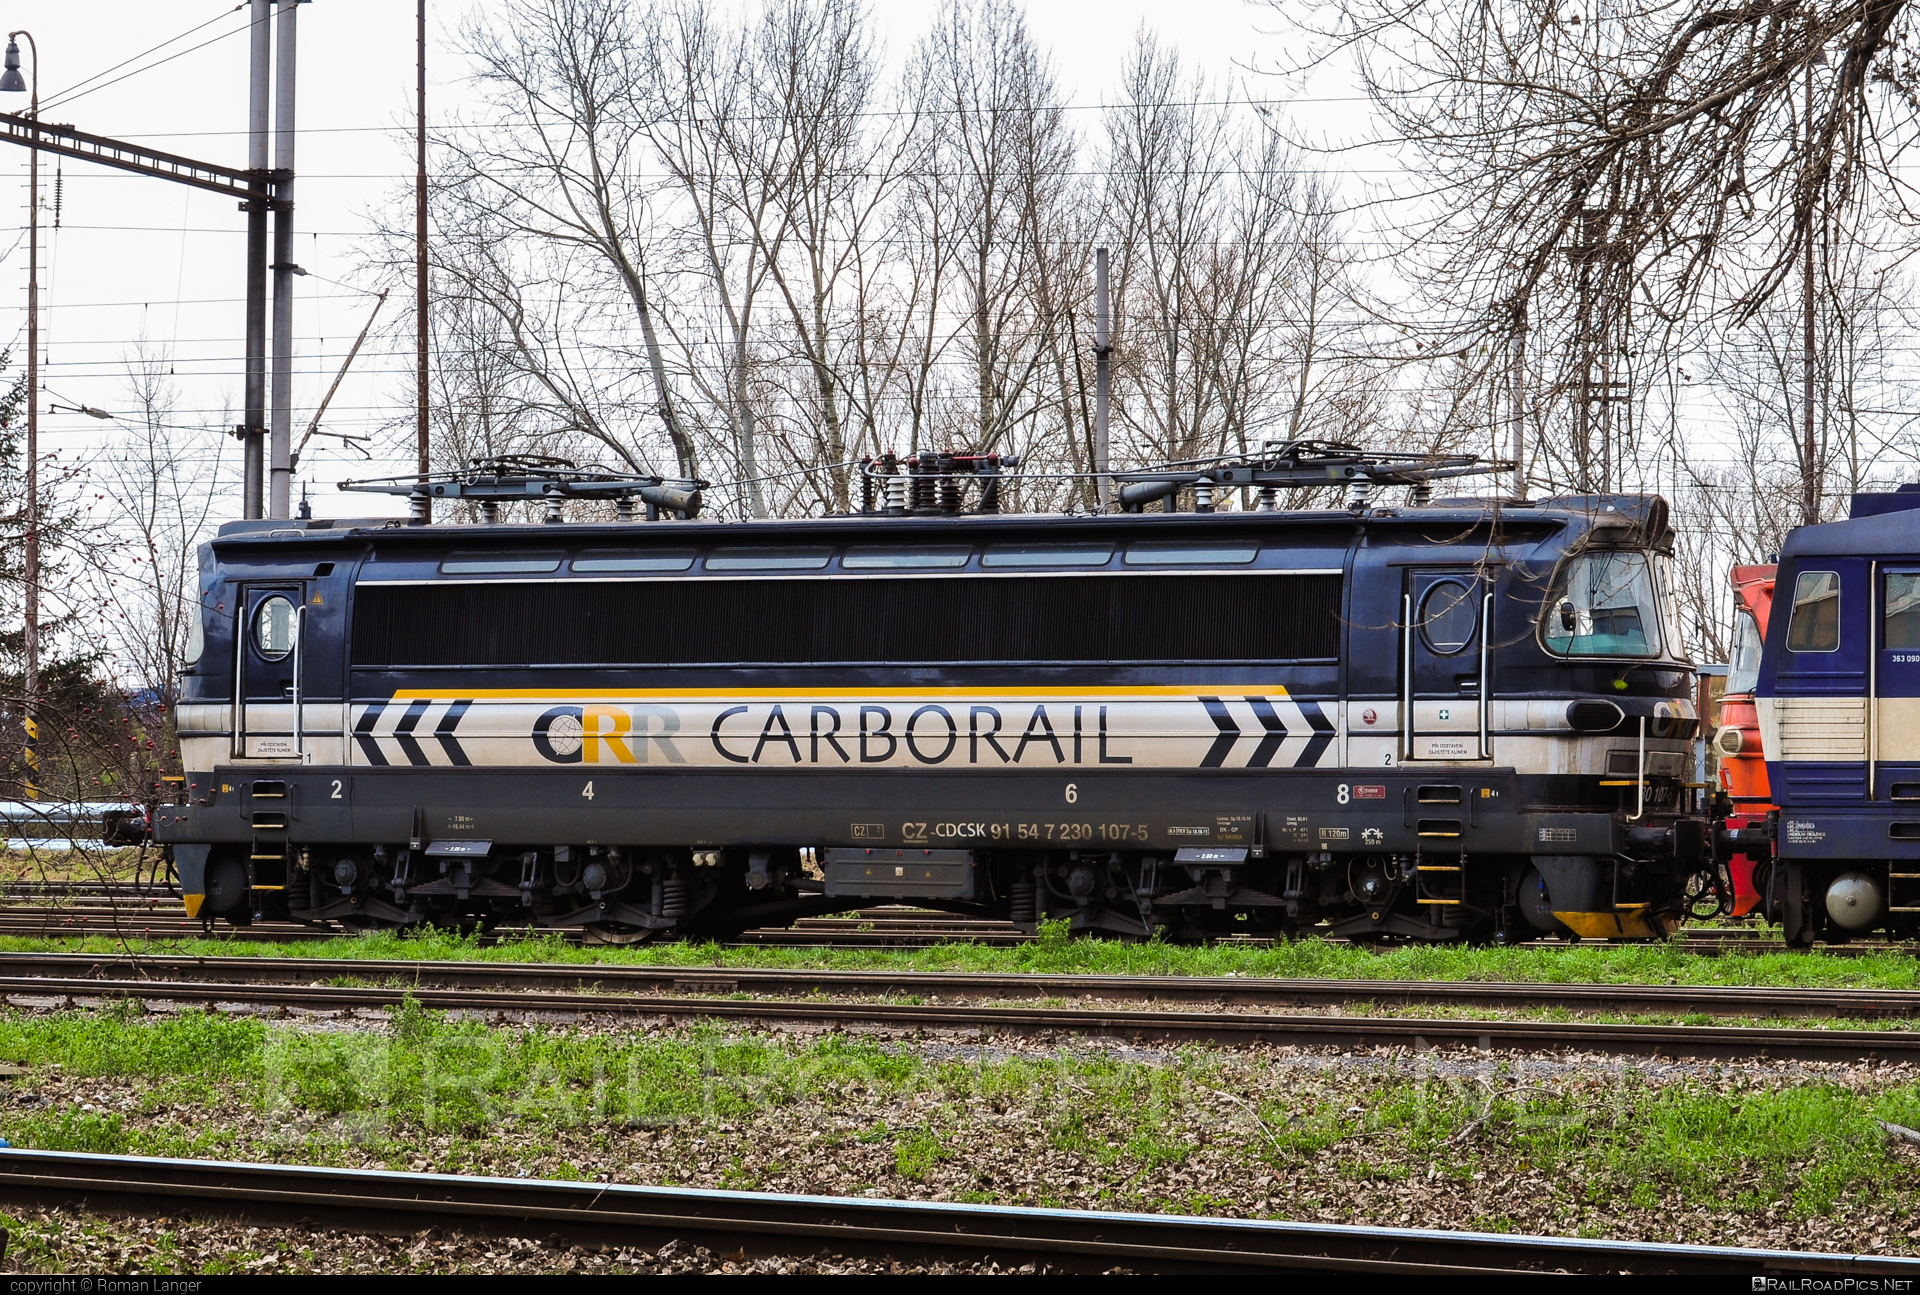 Škoda 47E - 230 107-5 operated by Retrack Slovakia s. r. o. #cdcargoslovakia #cdcsk #laminatka #locomotive240 #retrackslovakia #skoda #skoda47e